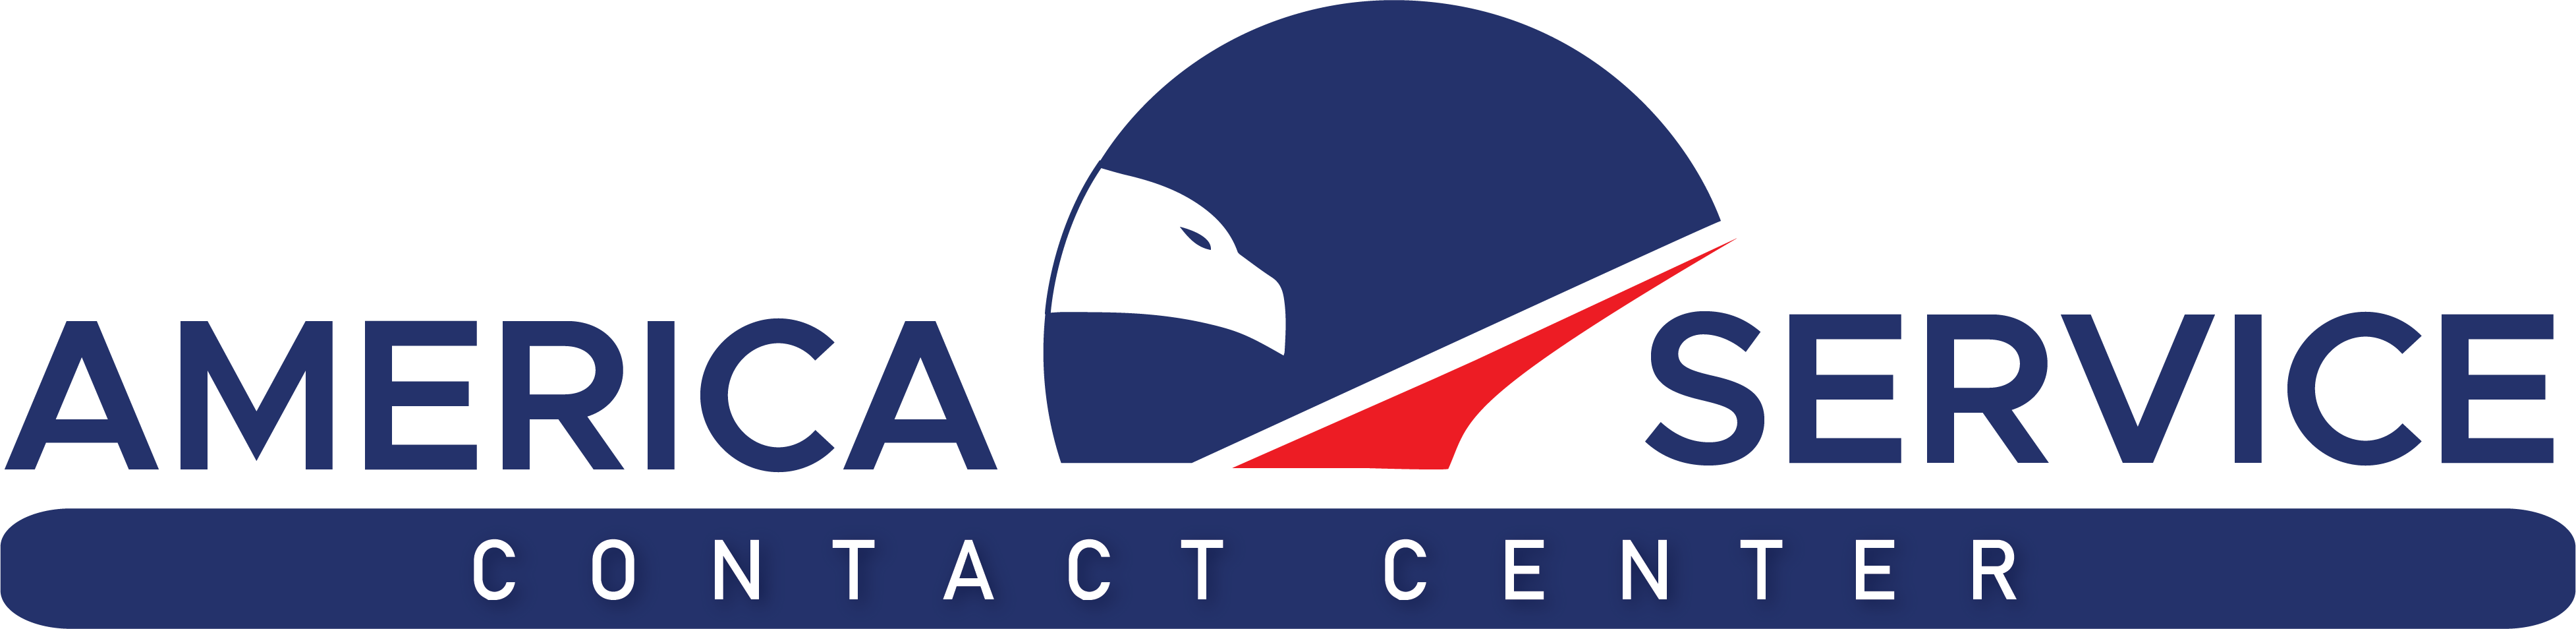 America Service Contact Center